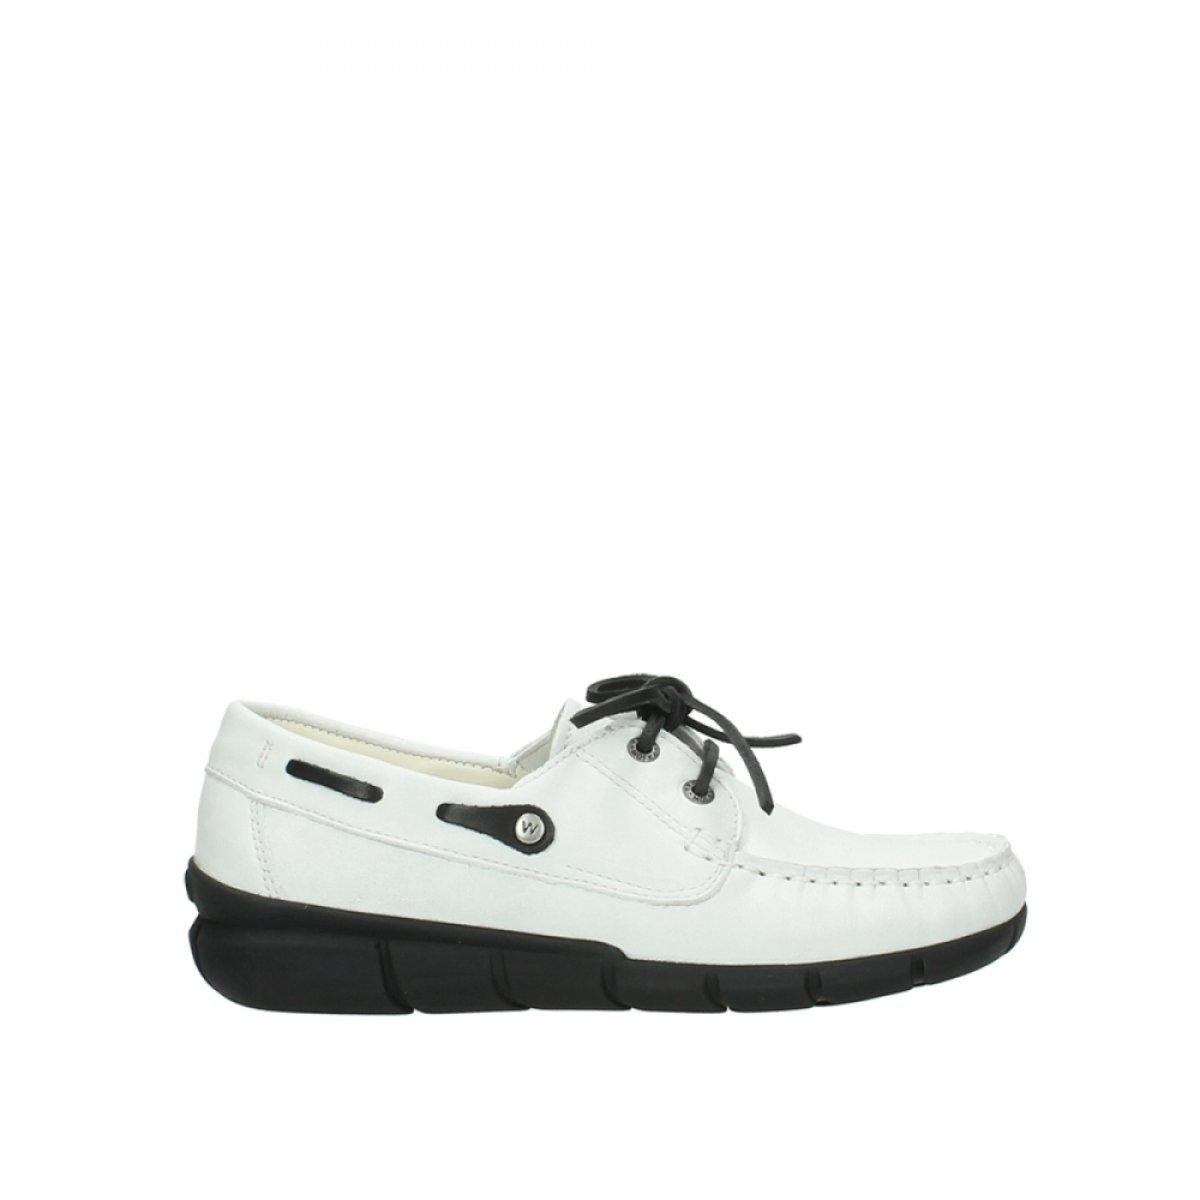 710 710 Blanc& x178; Leder Wolky Comfort Chaussures à Lacets 01509 Cahita  magasin fashional à vendre